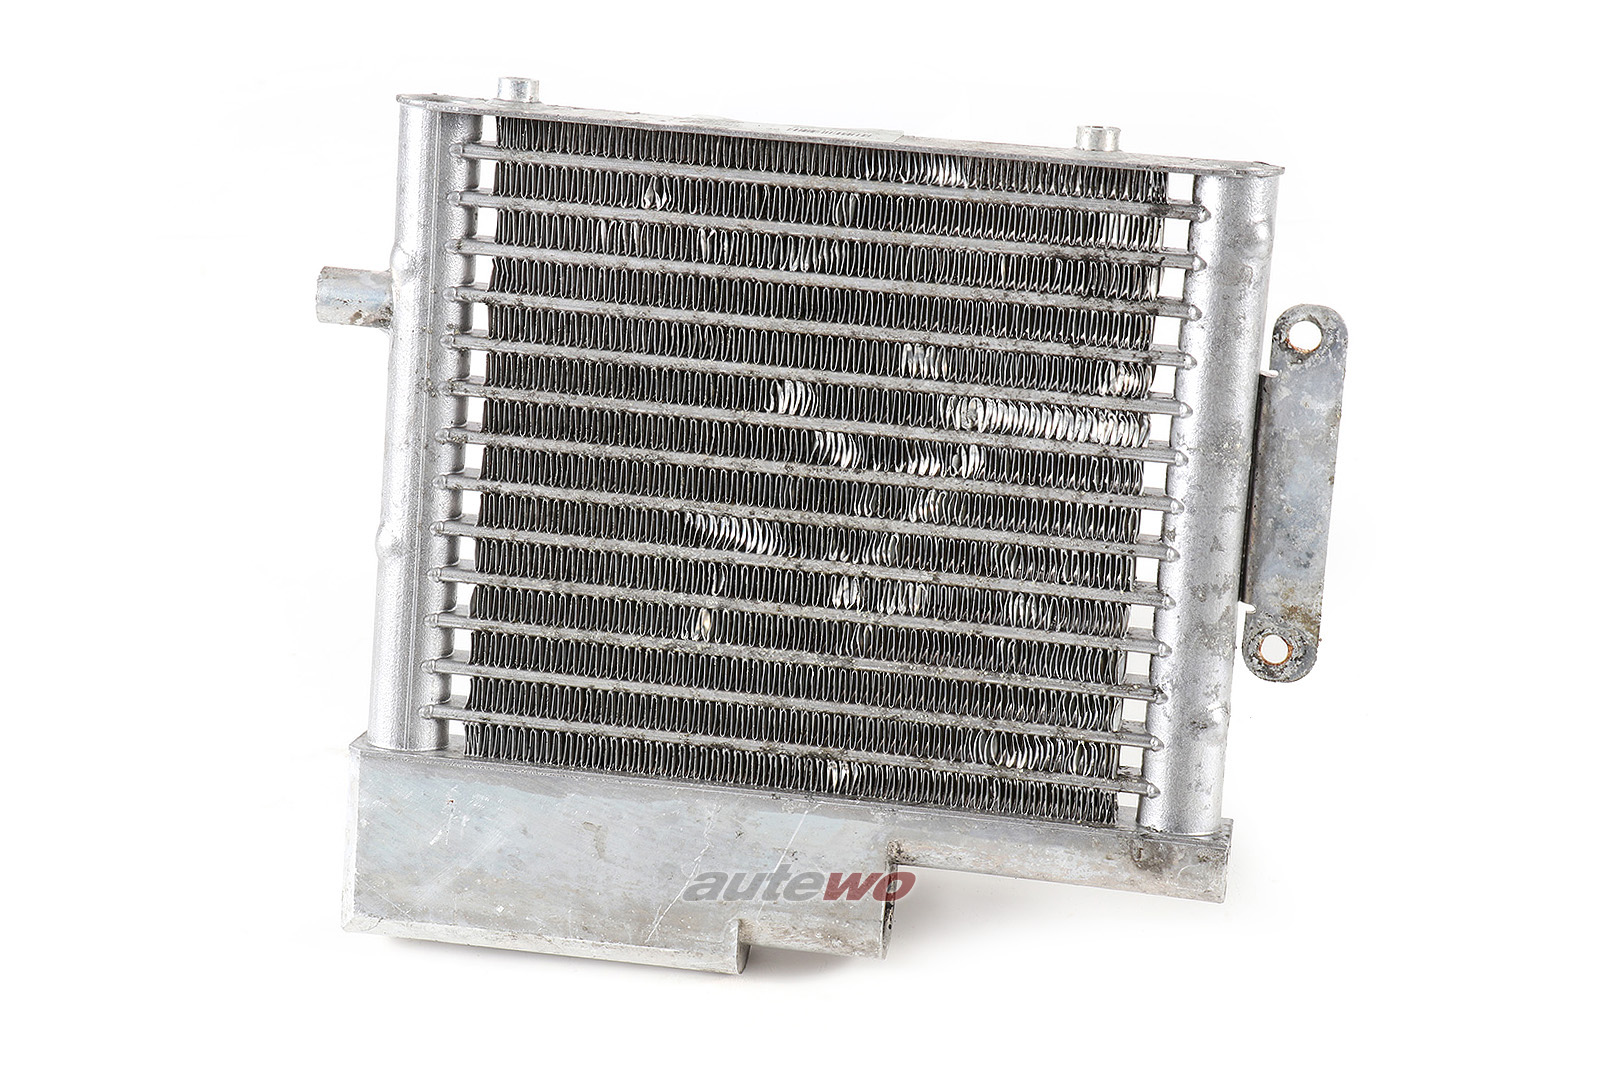 8E0317021A Audi A4 8E 2.5l Getriebe-Ölkühler